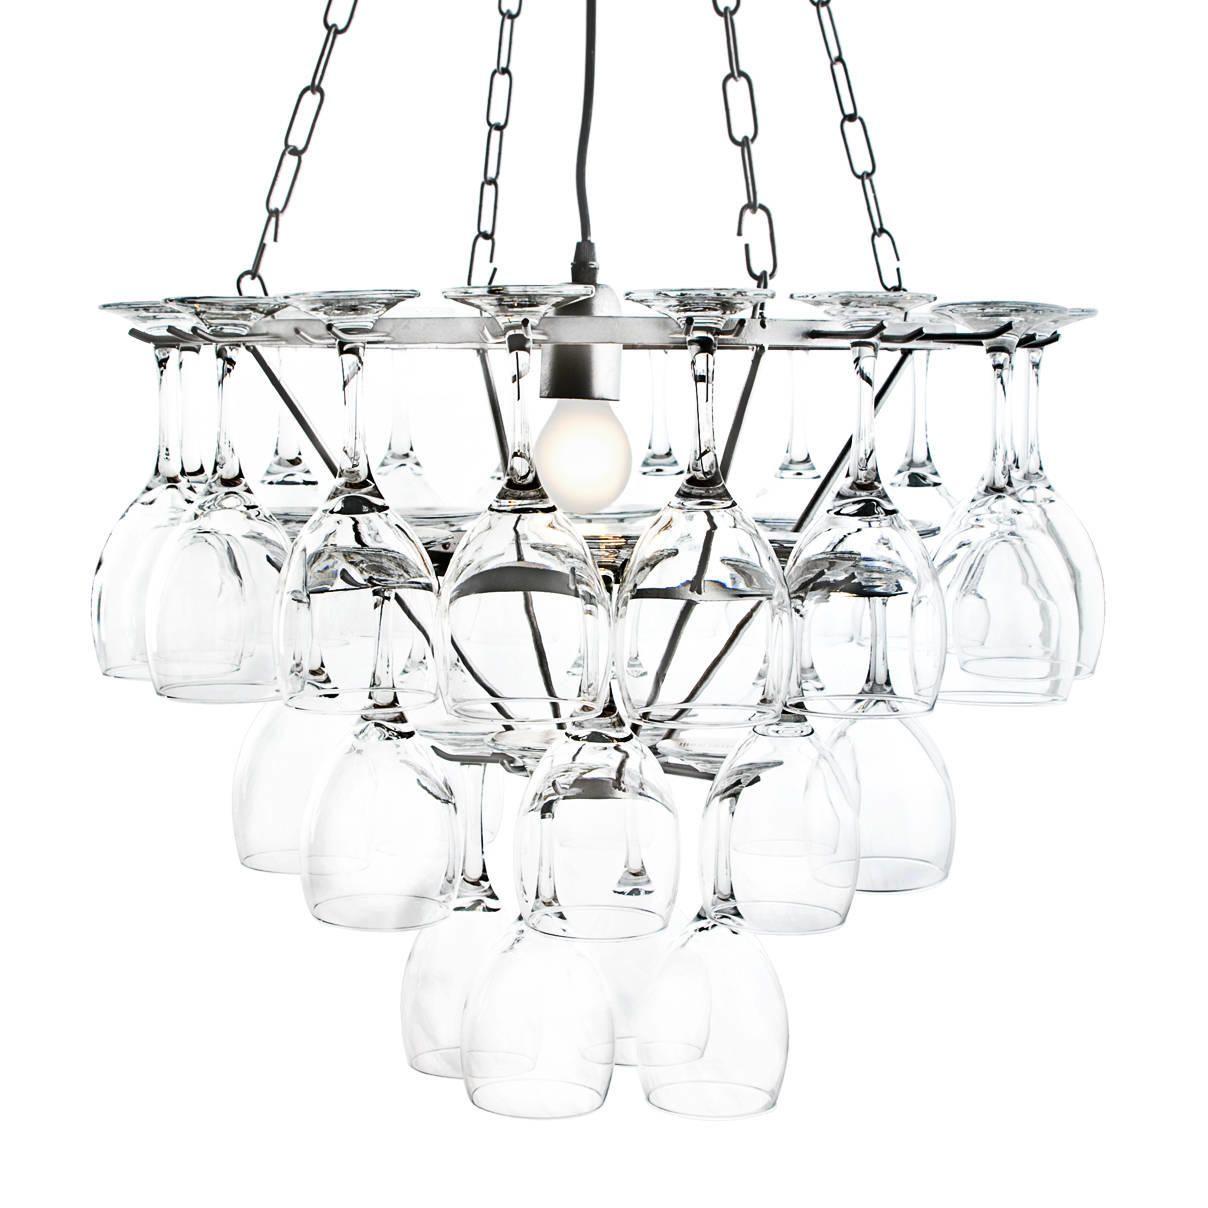 2 tier kitchen island create your own wine glass chandelier - 3 in silver from litecraft